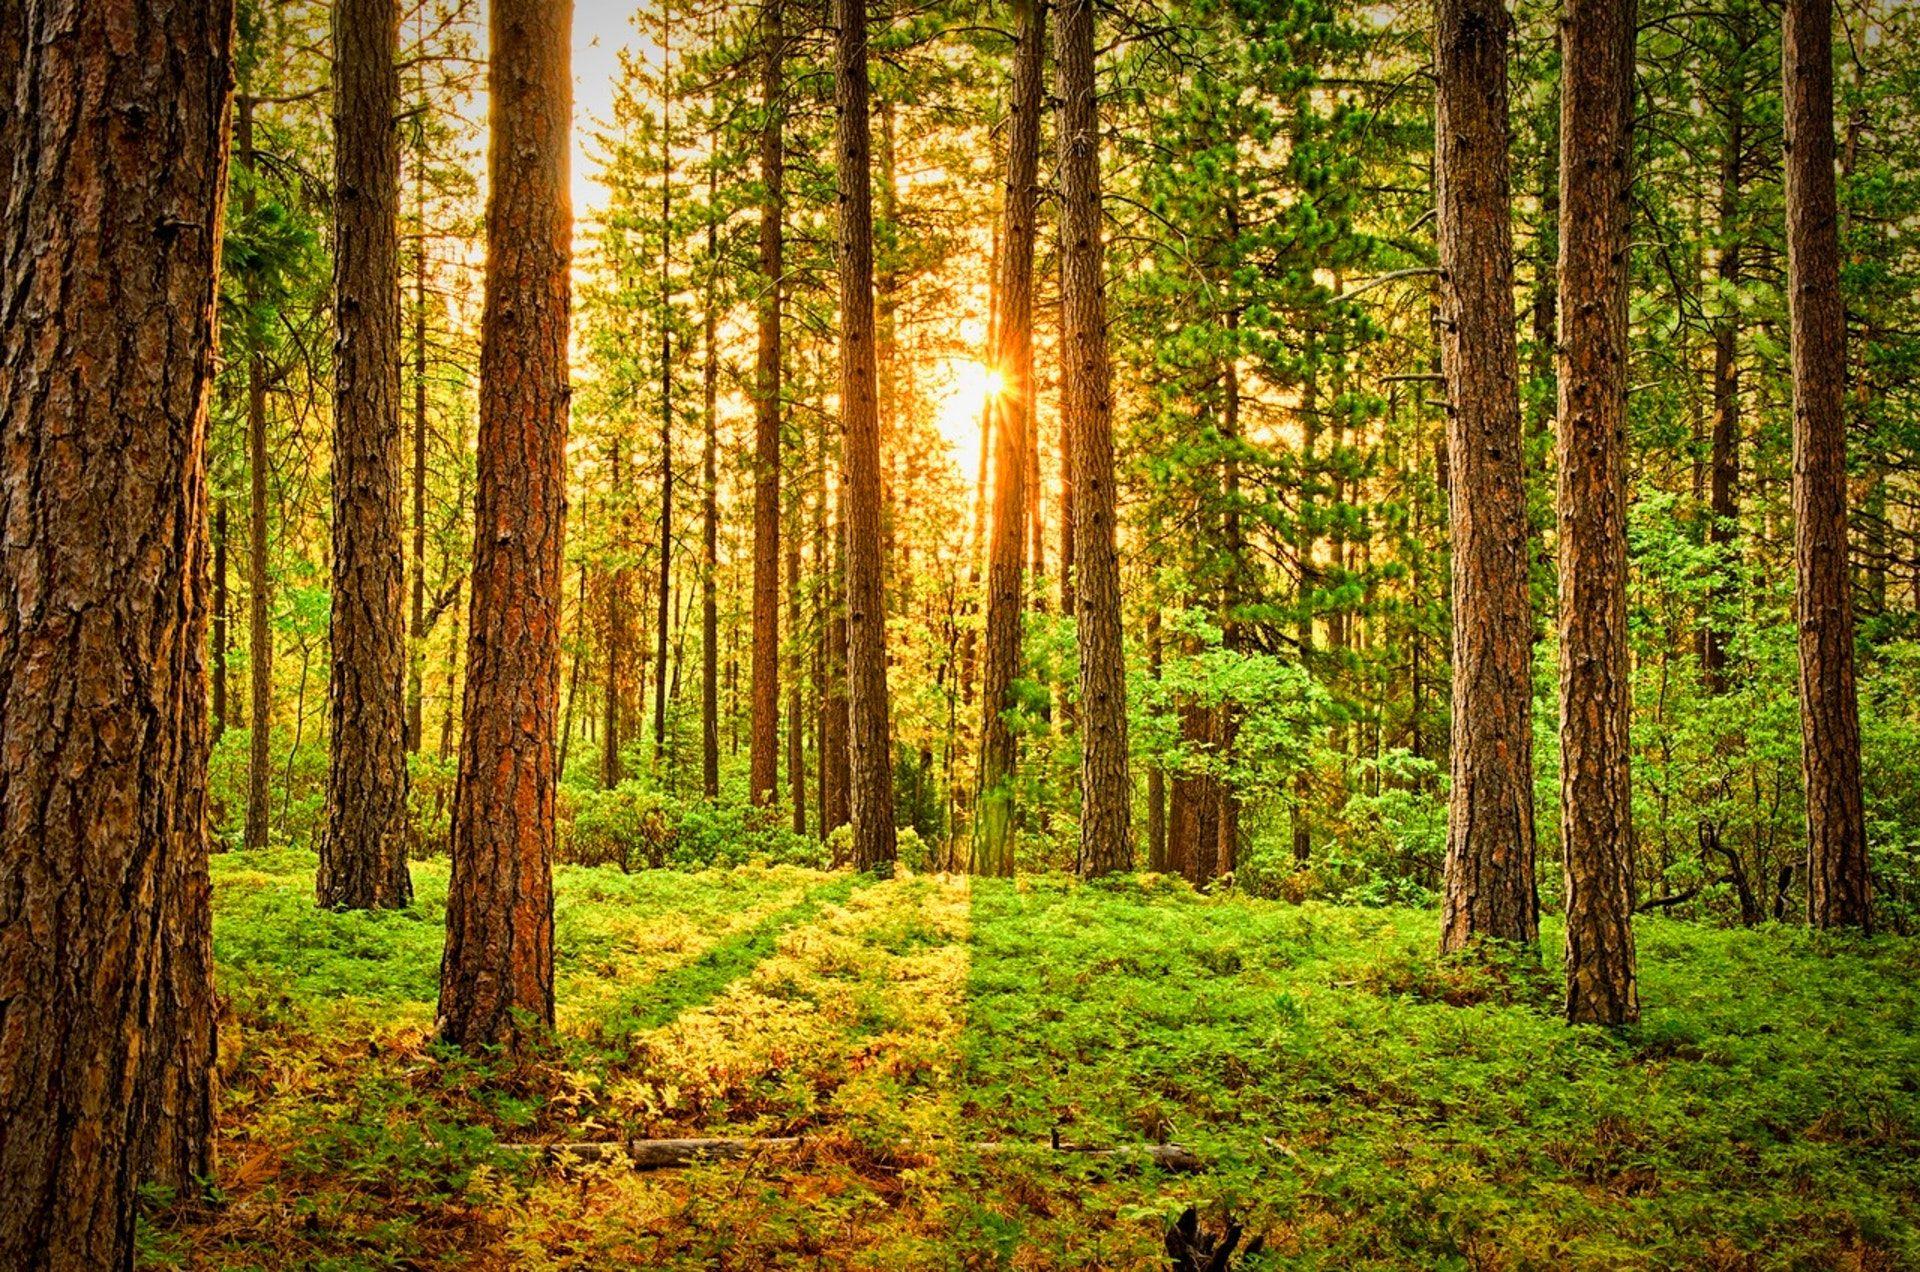 عکس زمینه تابش نور خورشید میان درختان سبز پس زمینه